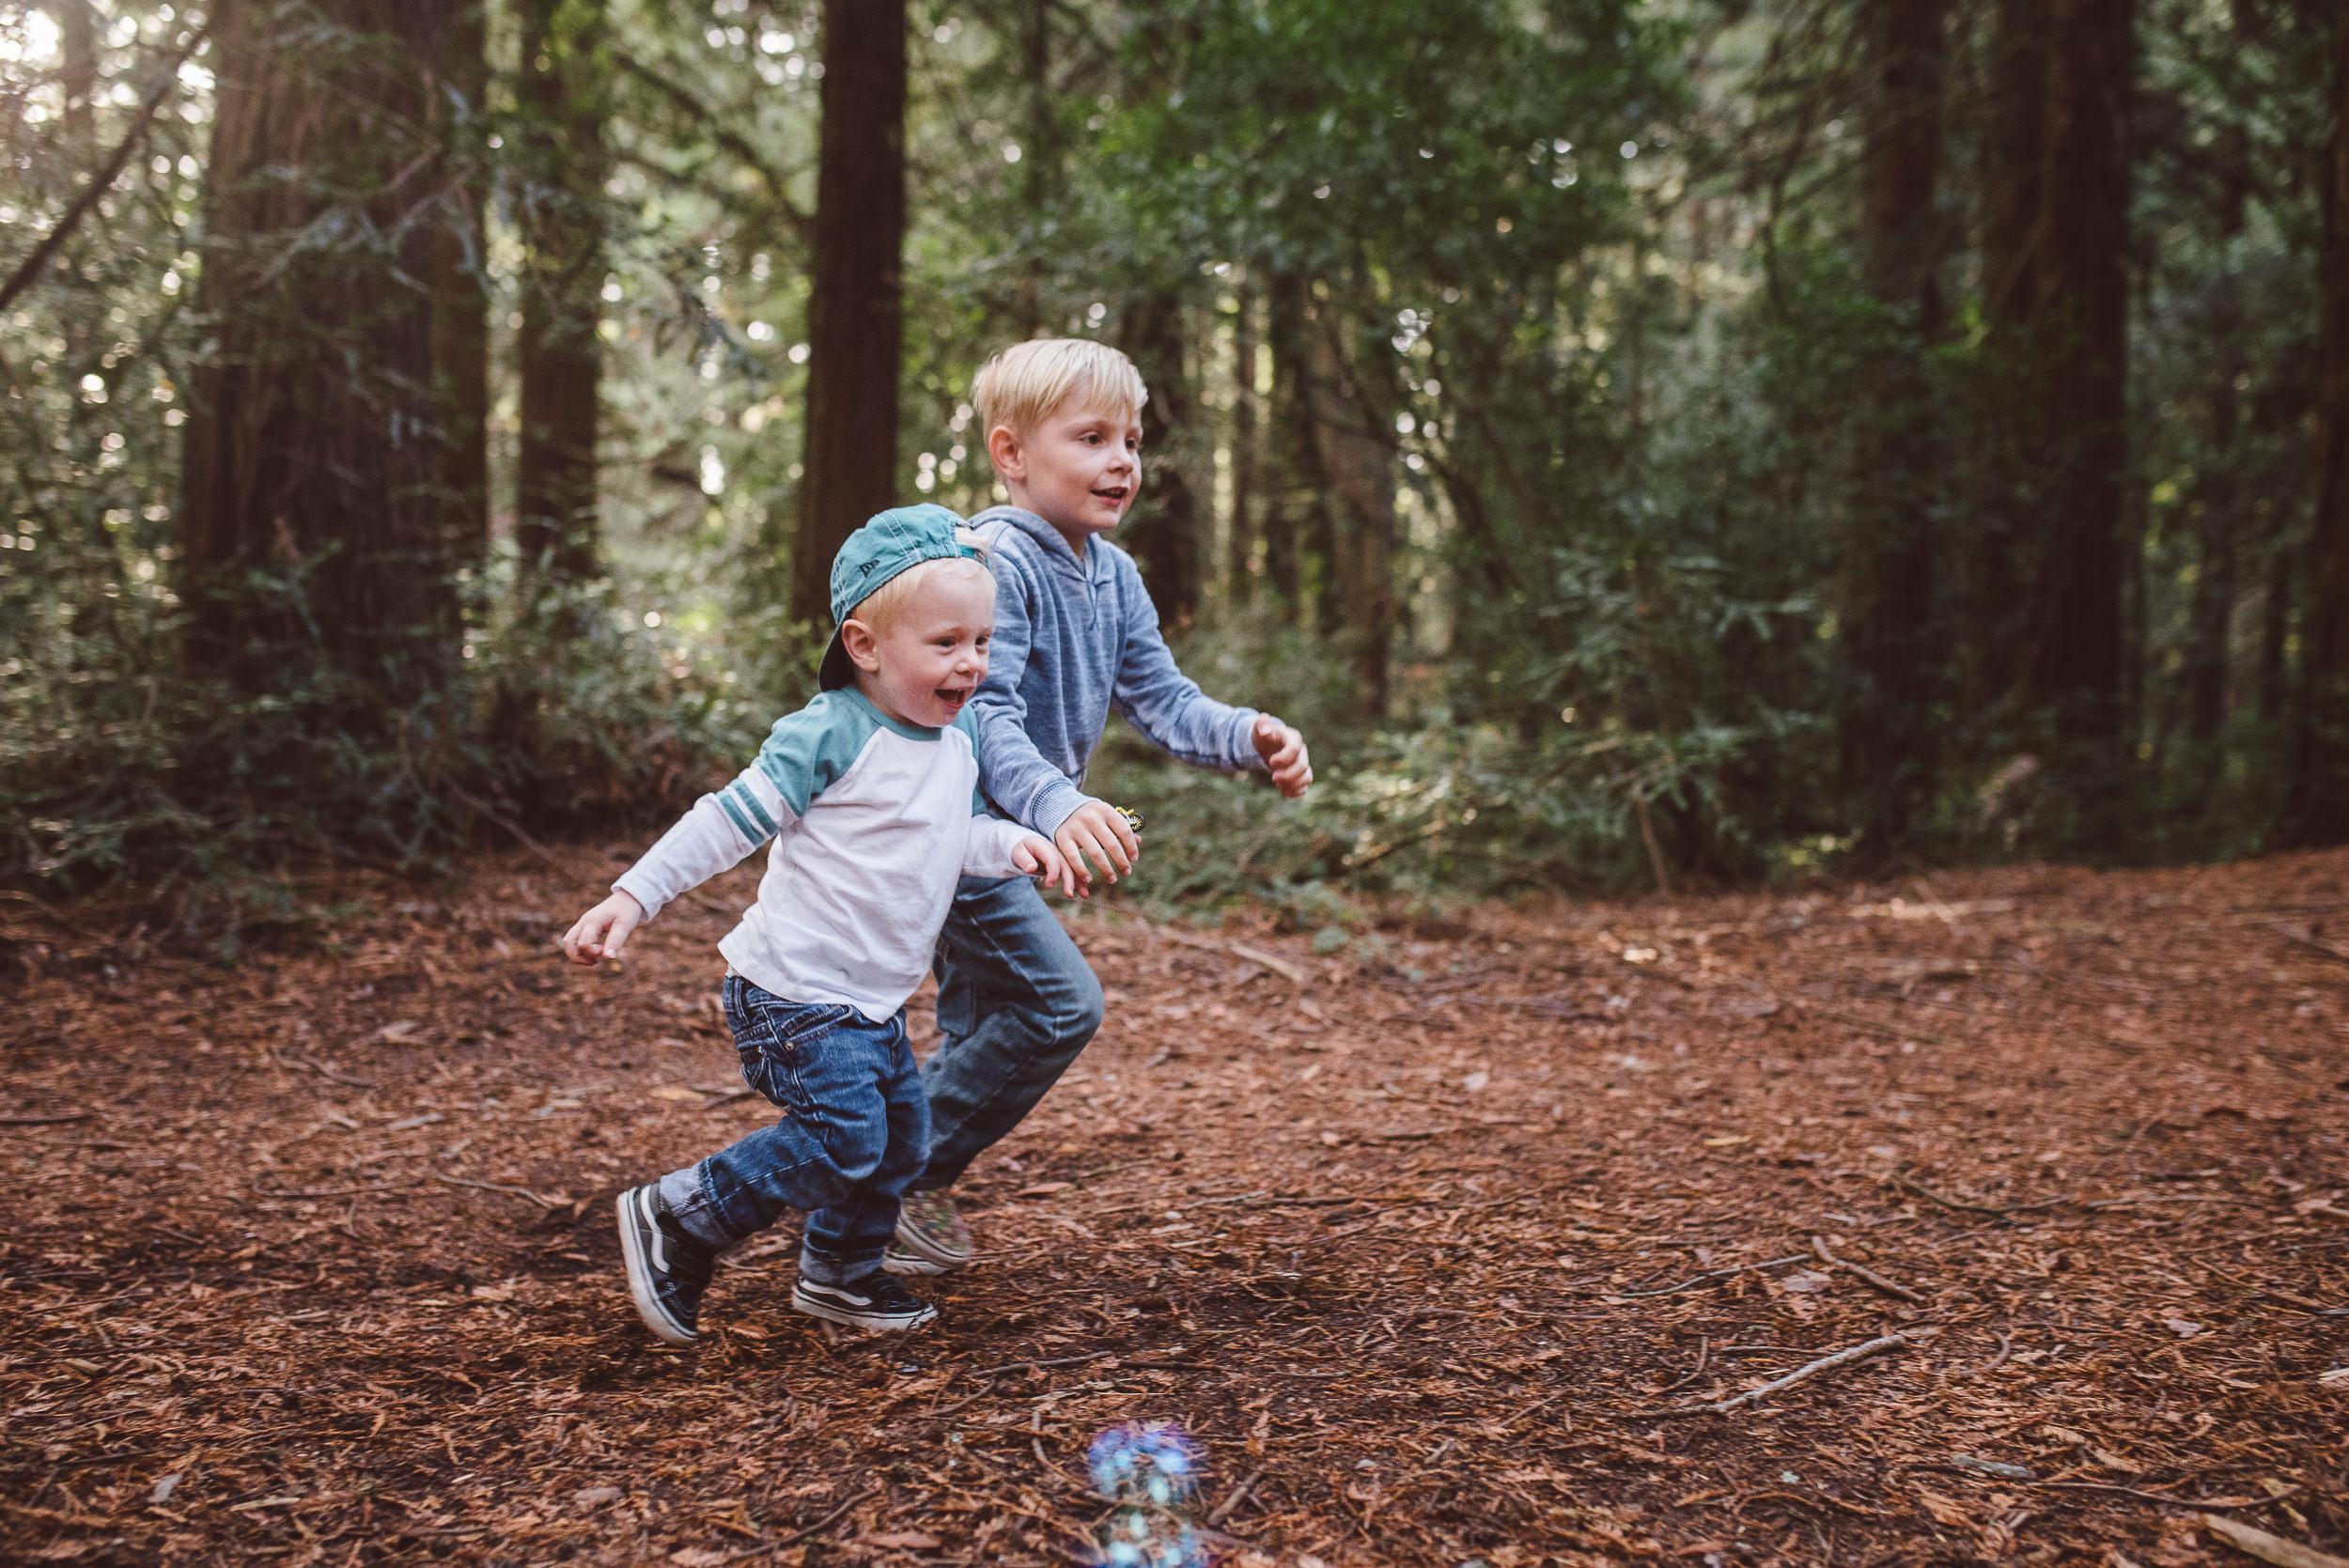 Joaquin-Miller-Park-Oakland-Family-Photography-020.jpg